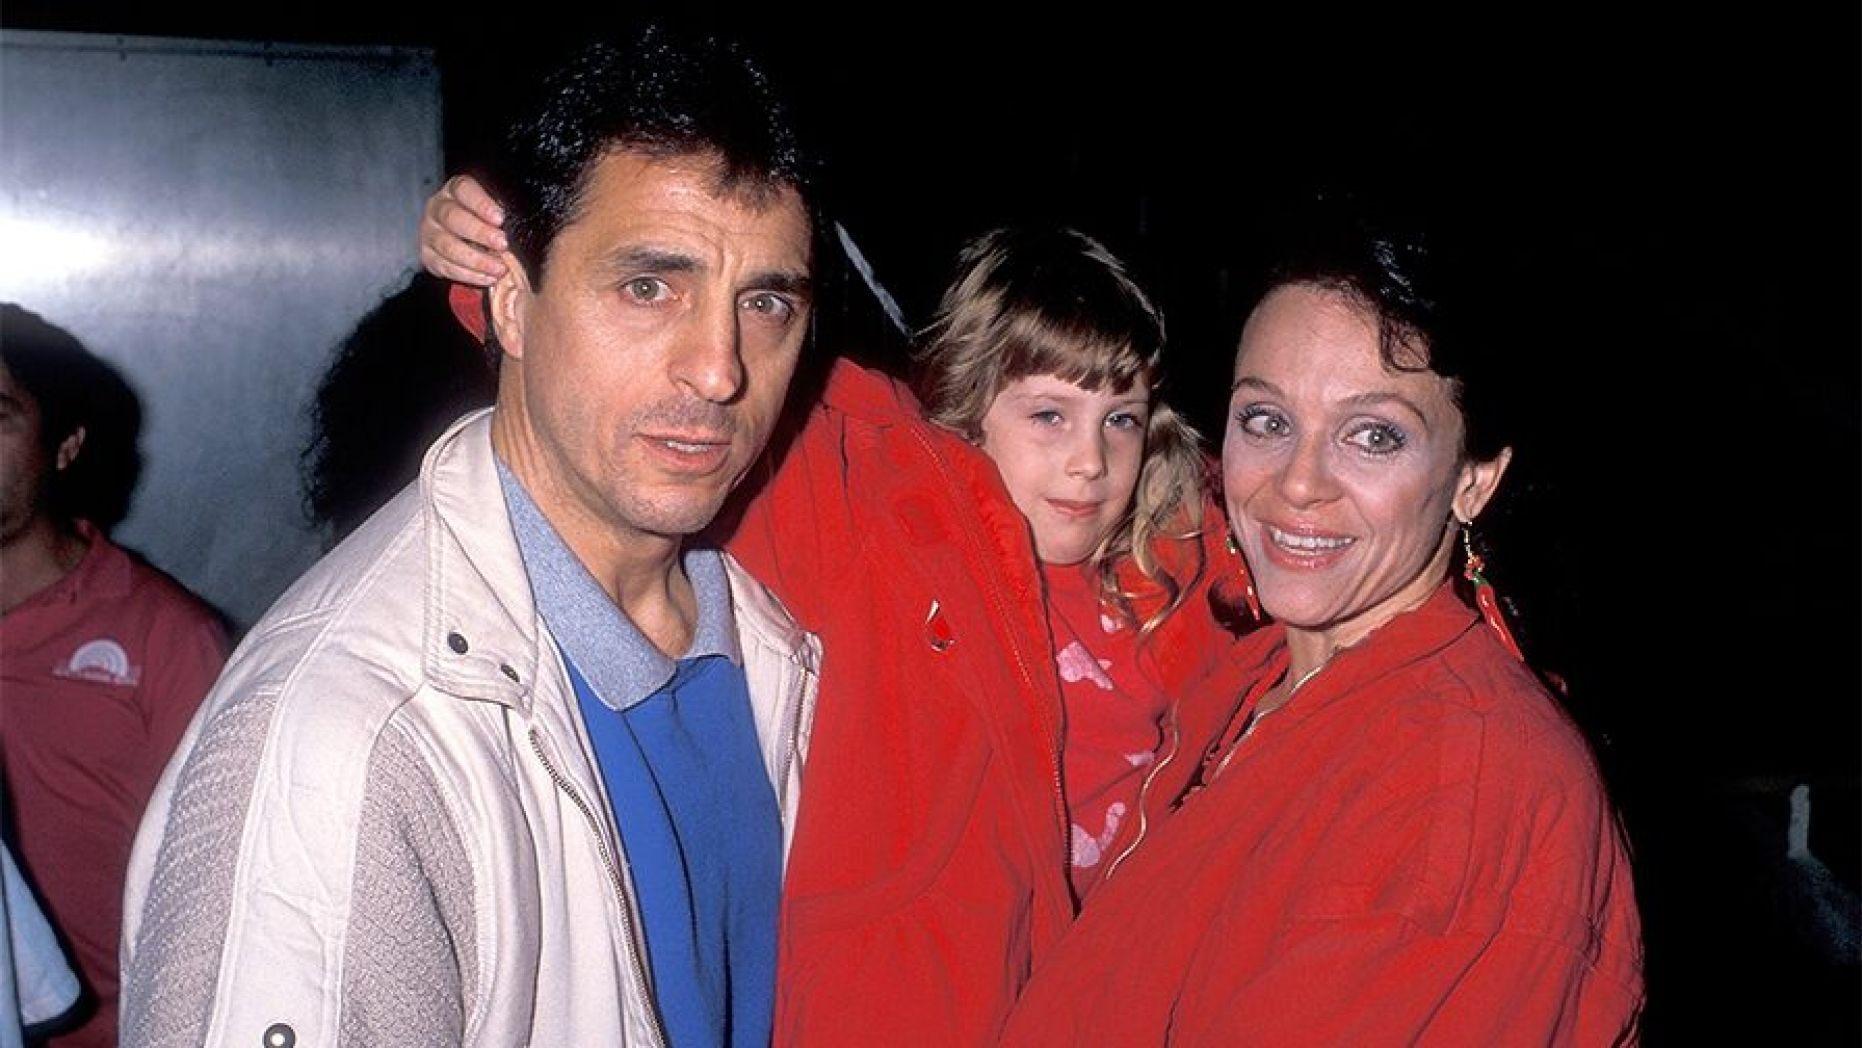 Cristina with her parents